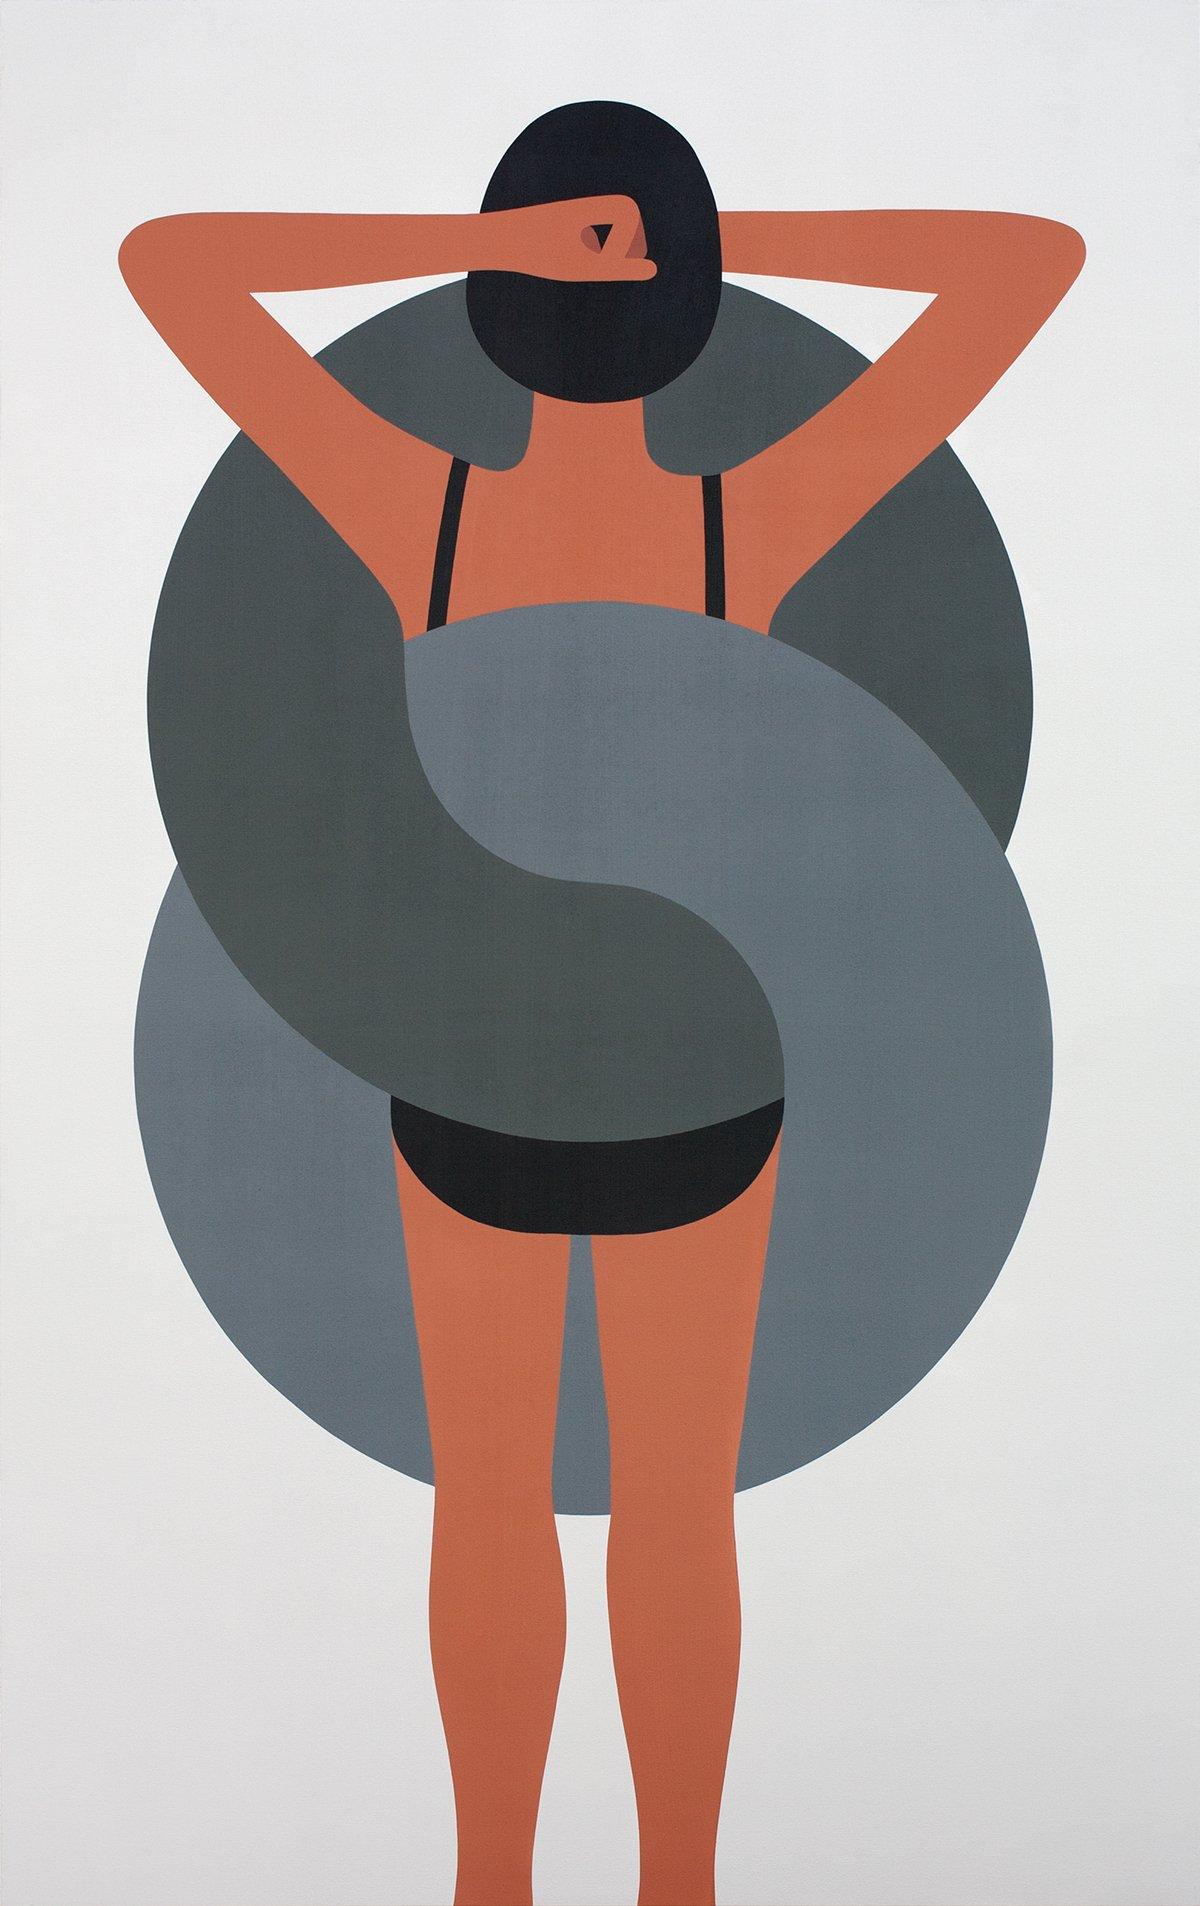 geoff_mcfetridge_paintings-designplayground_06